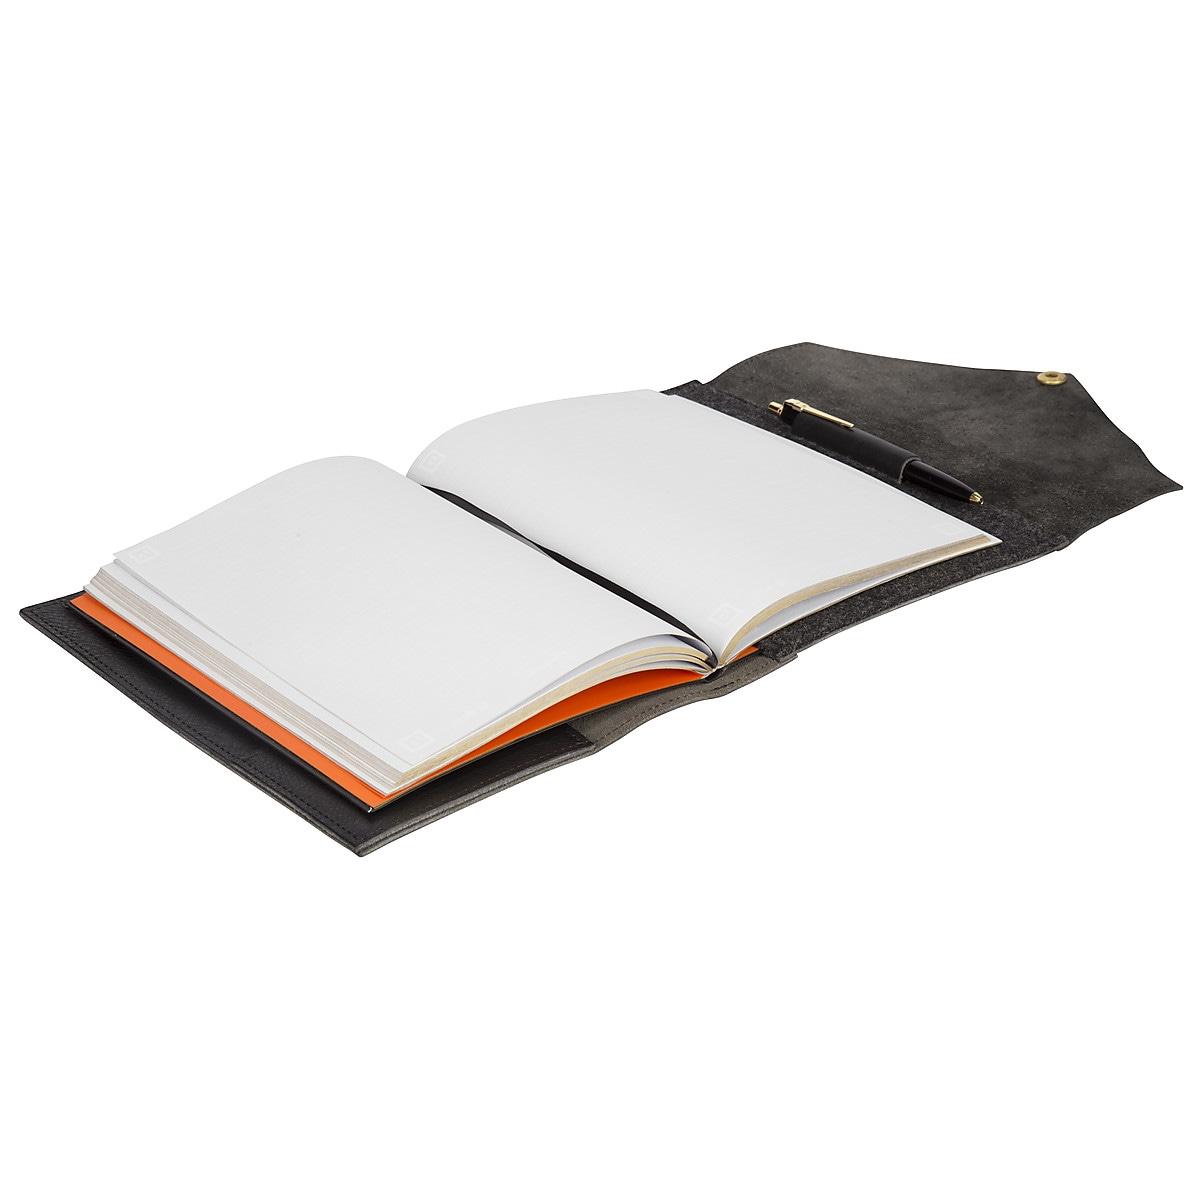 Limited Edition Notatbok med skinnomslag og penn